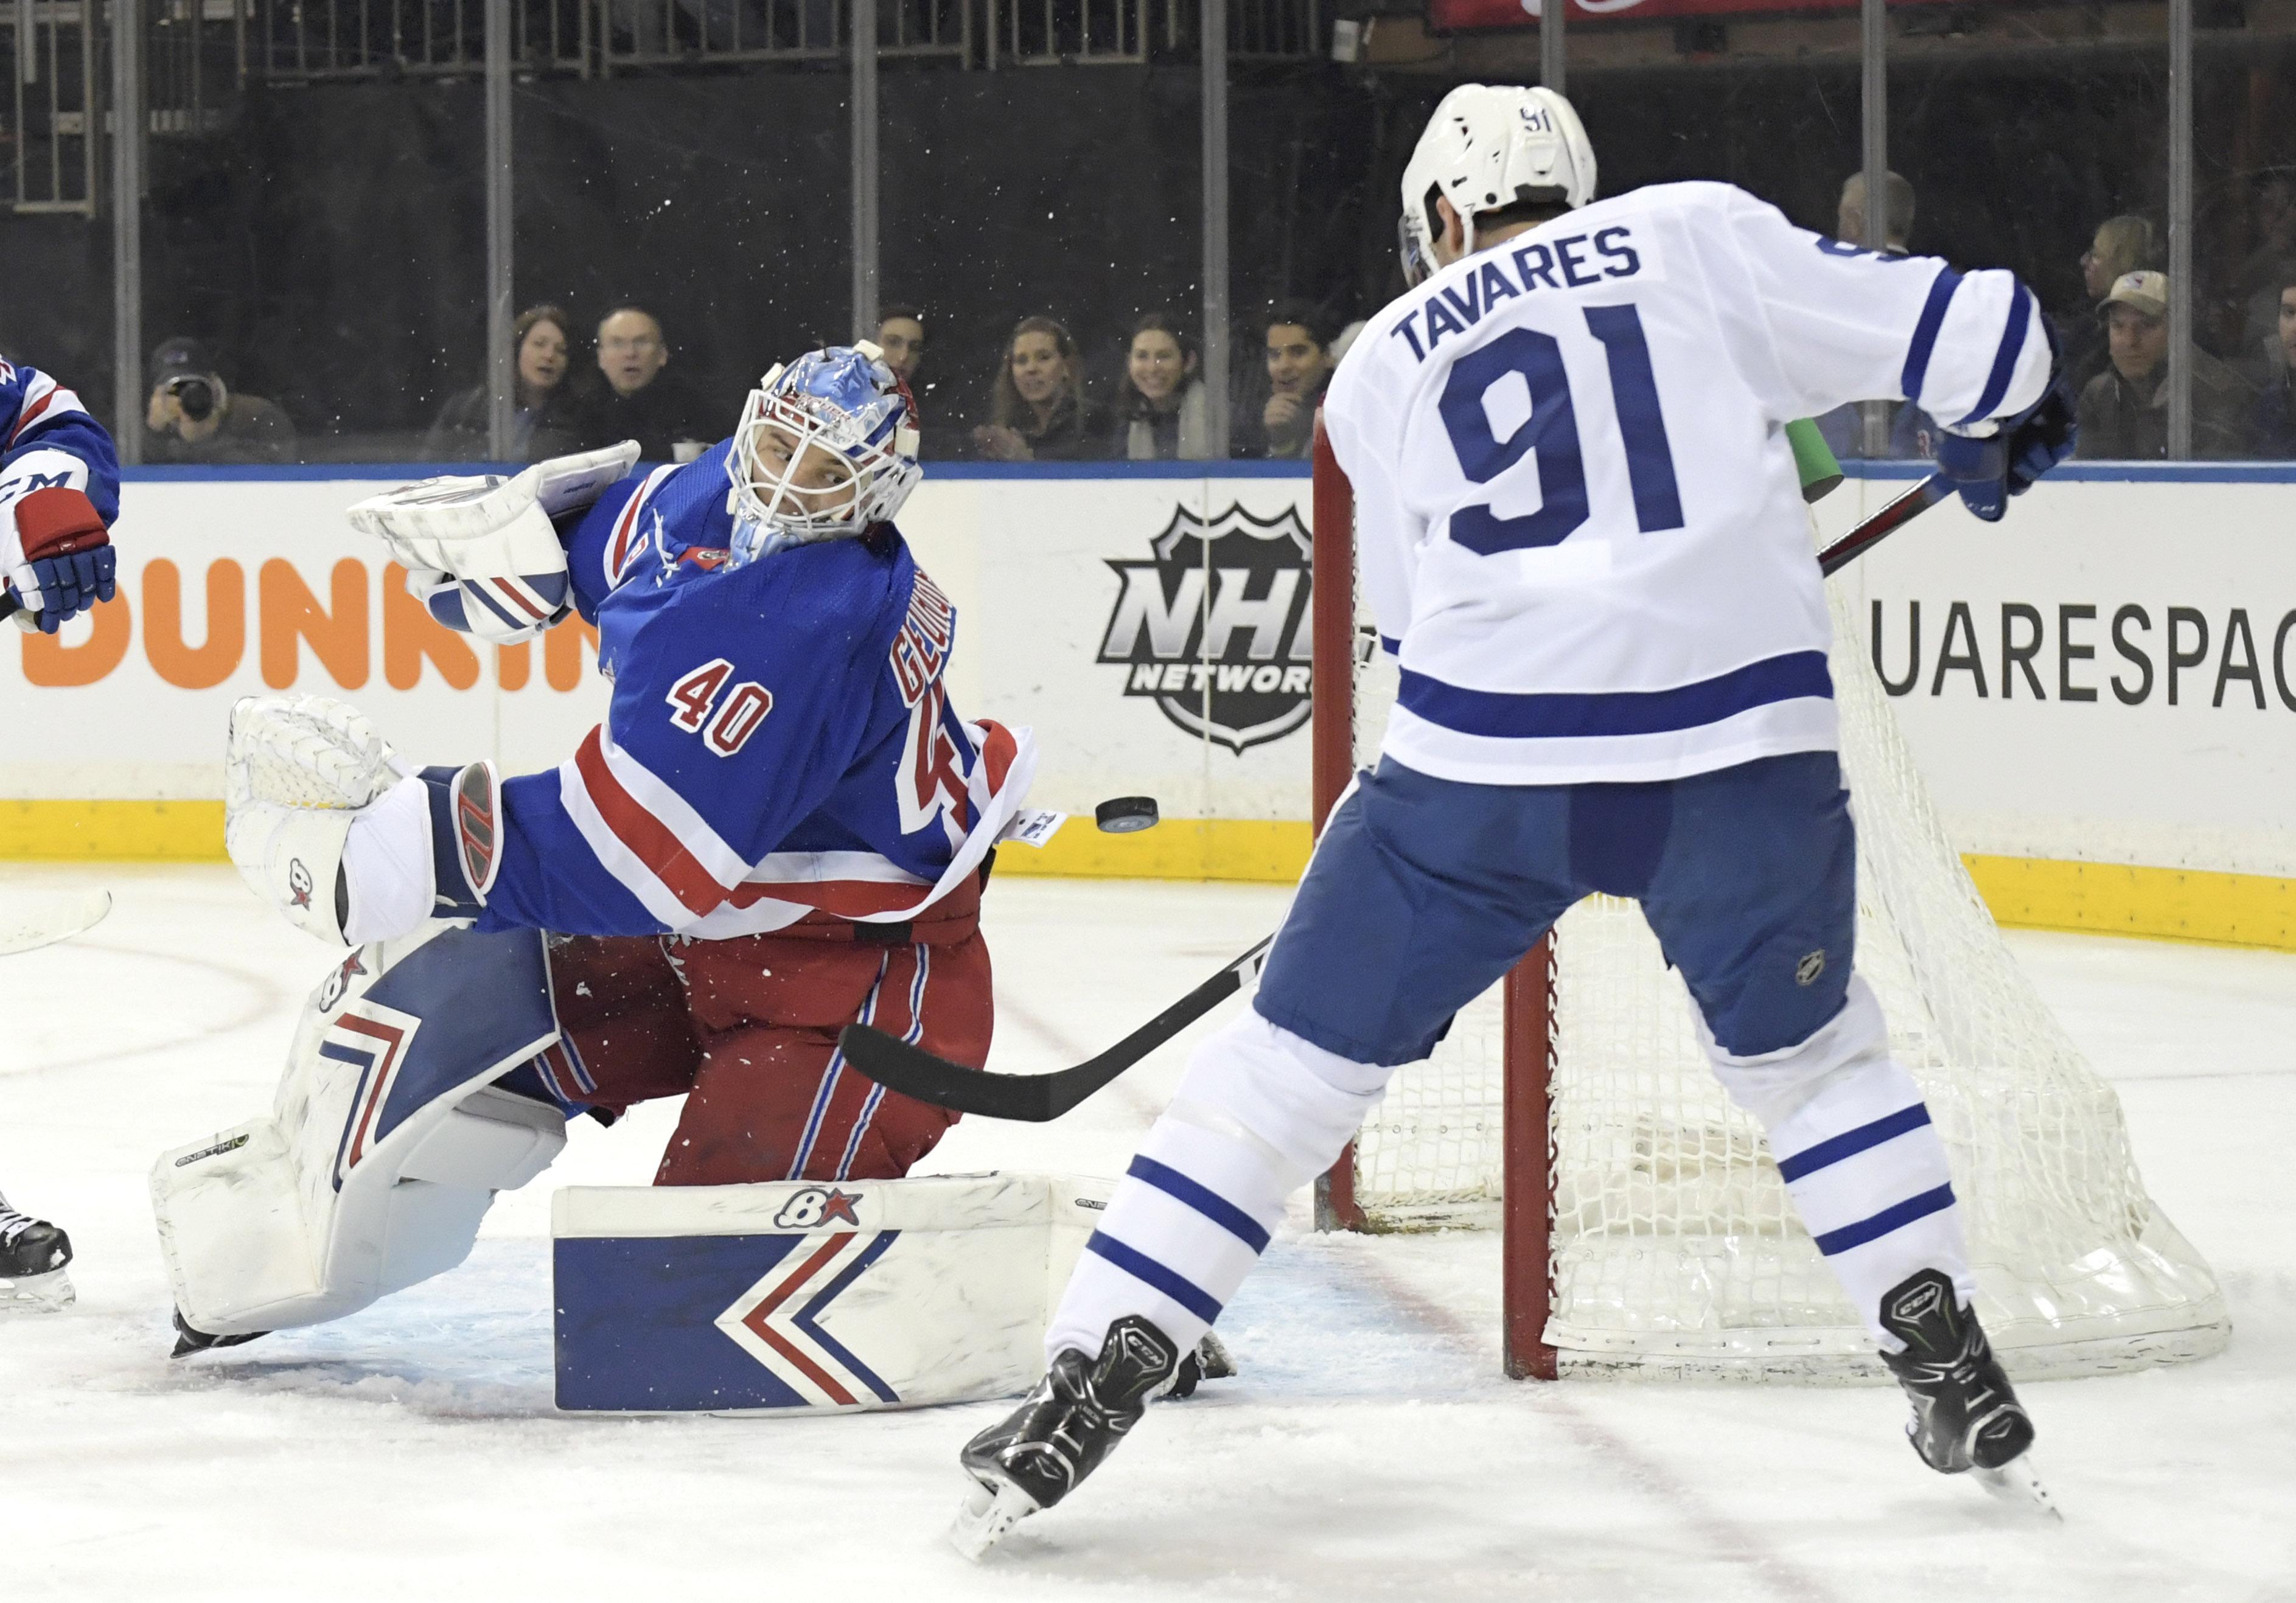 Georgiev's 55 saves help Rangers cool off Leafs 4-1